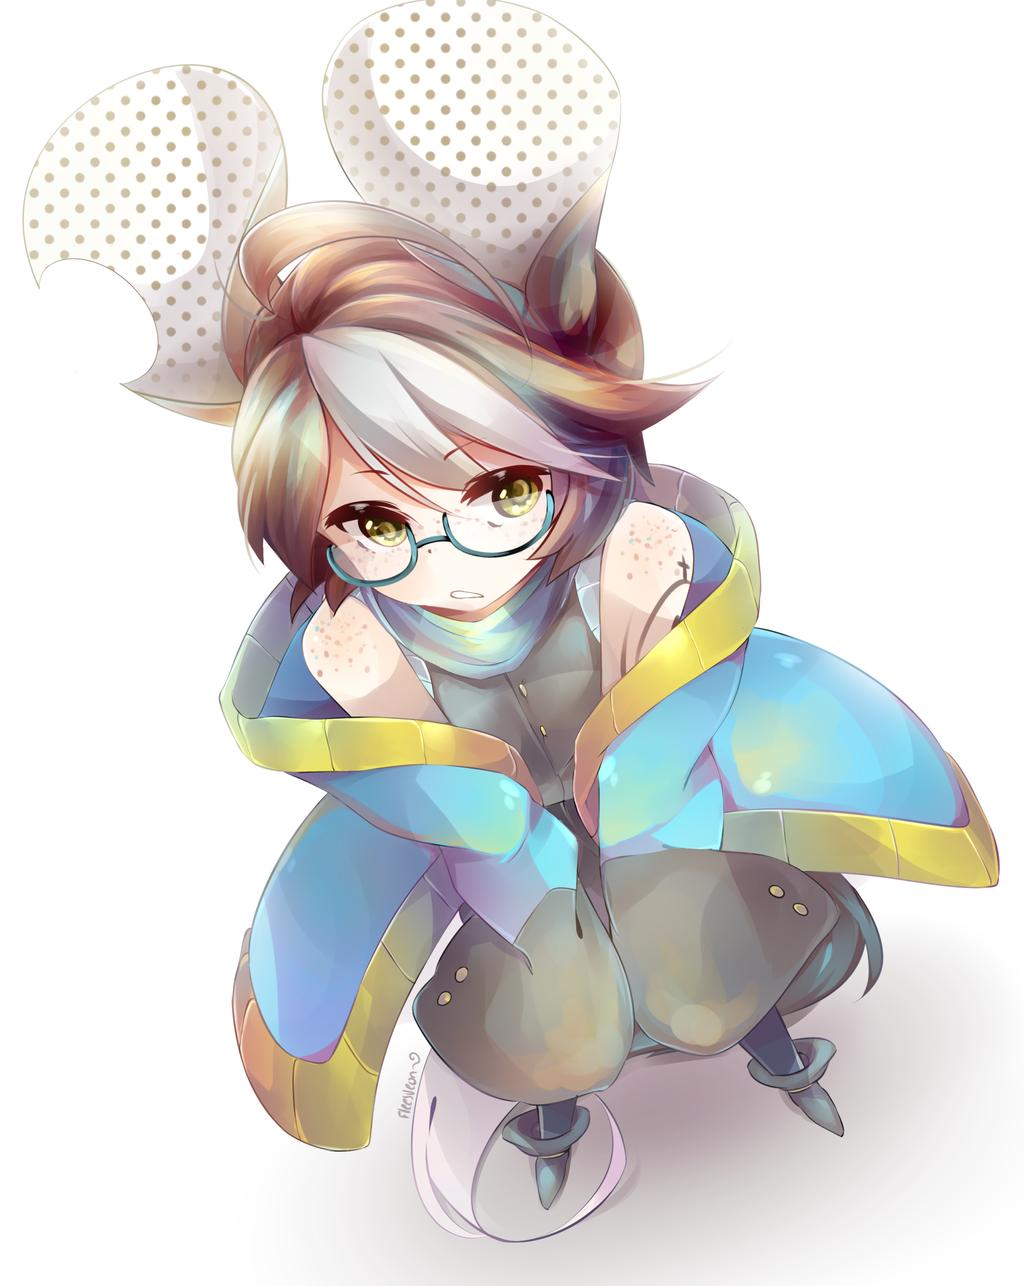 Little Chuuya by fleesveon